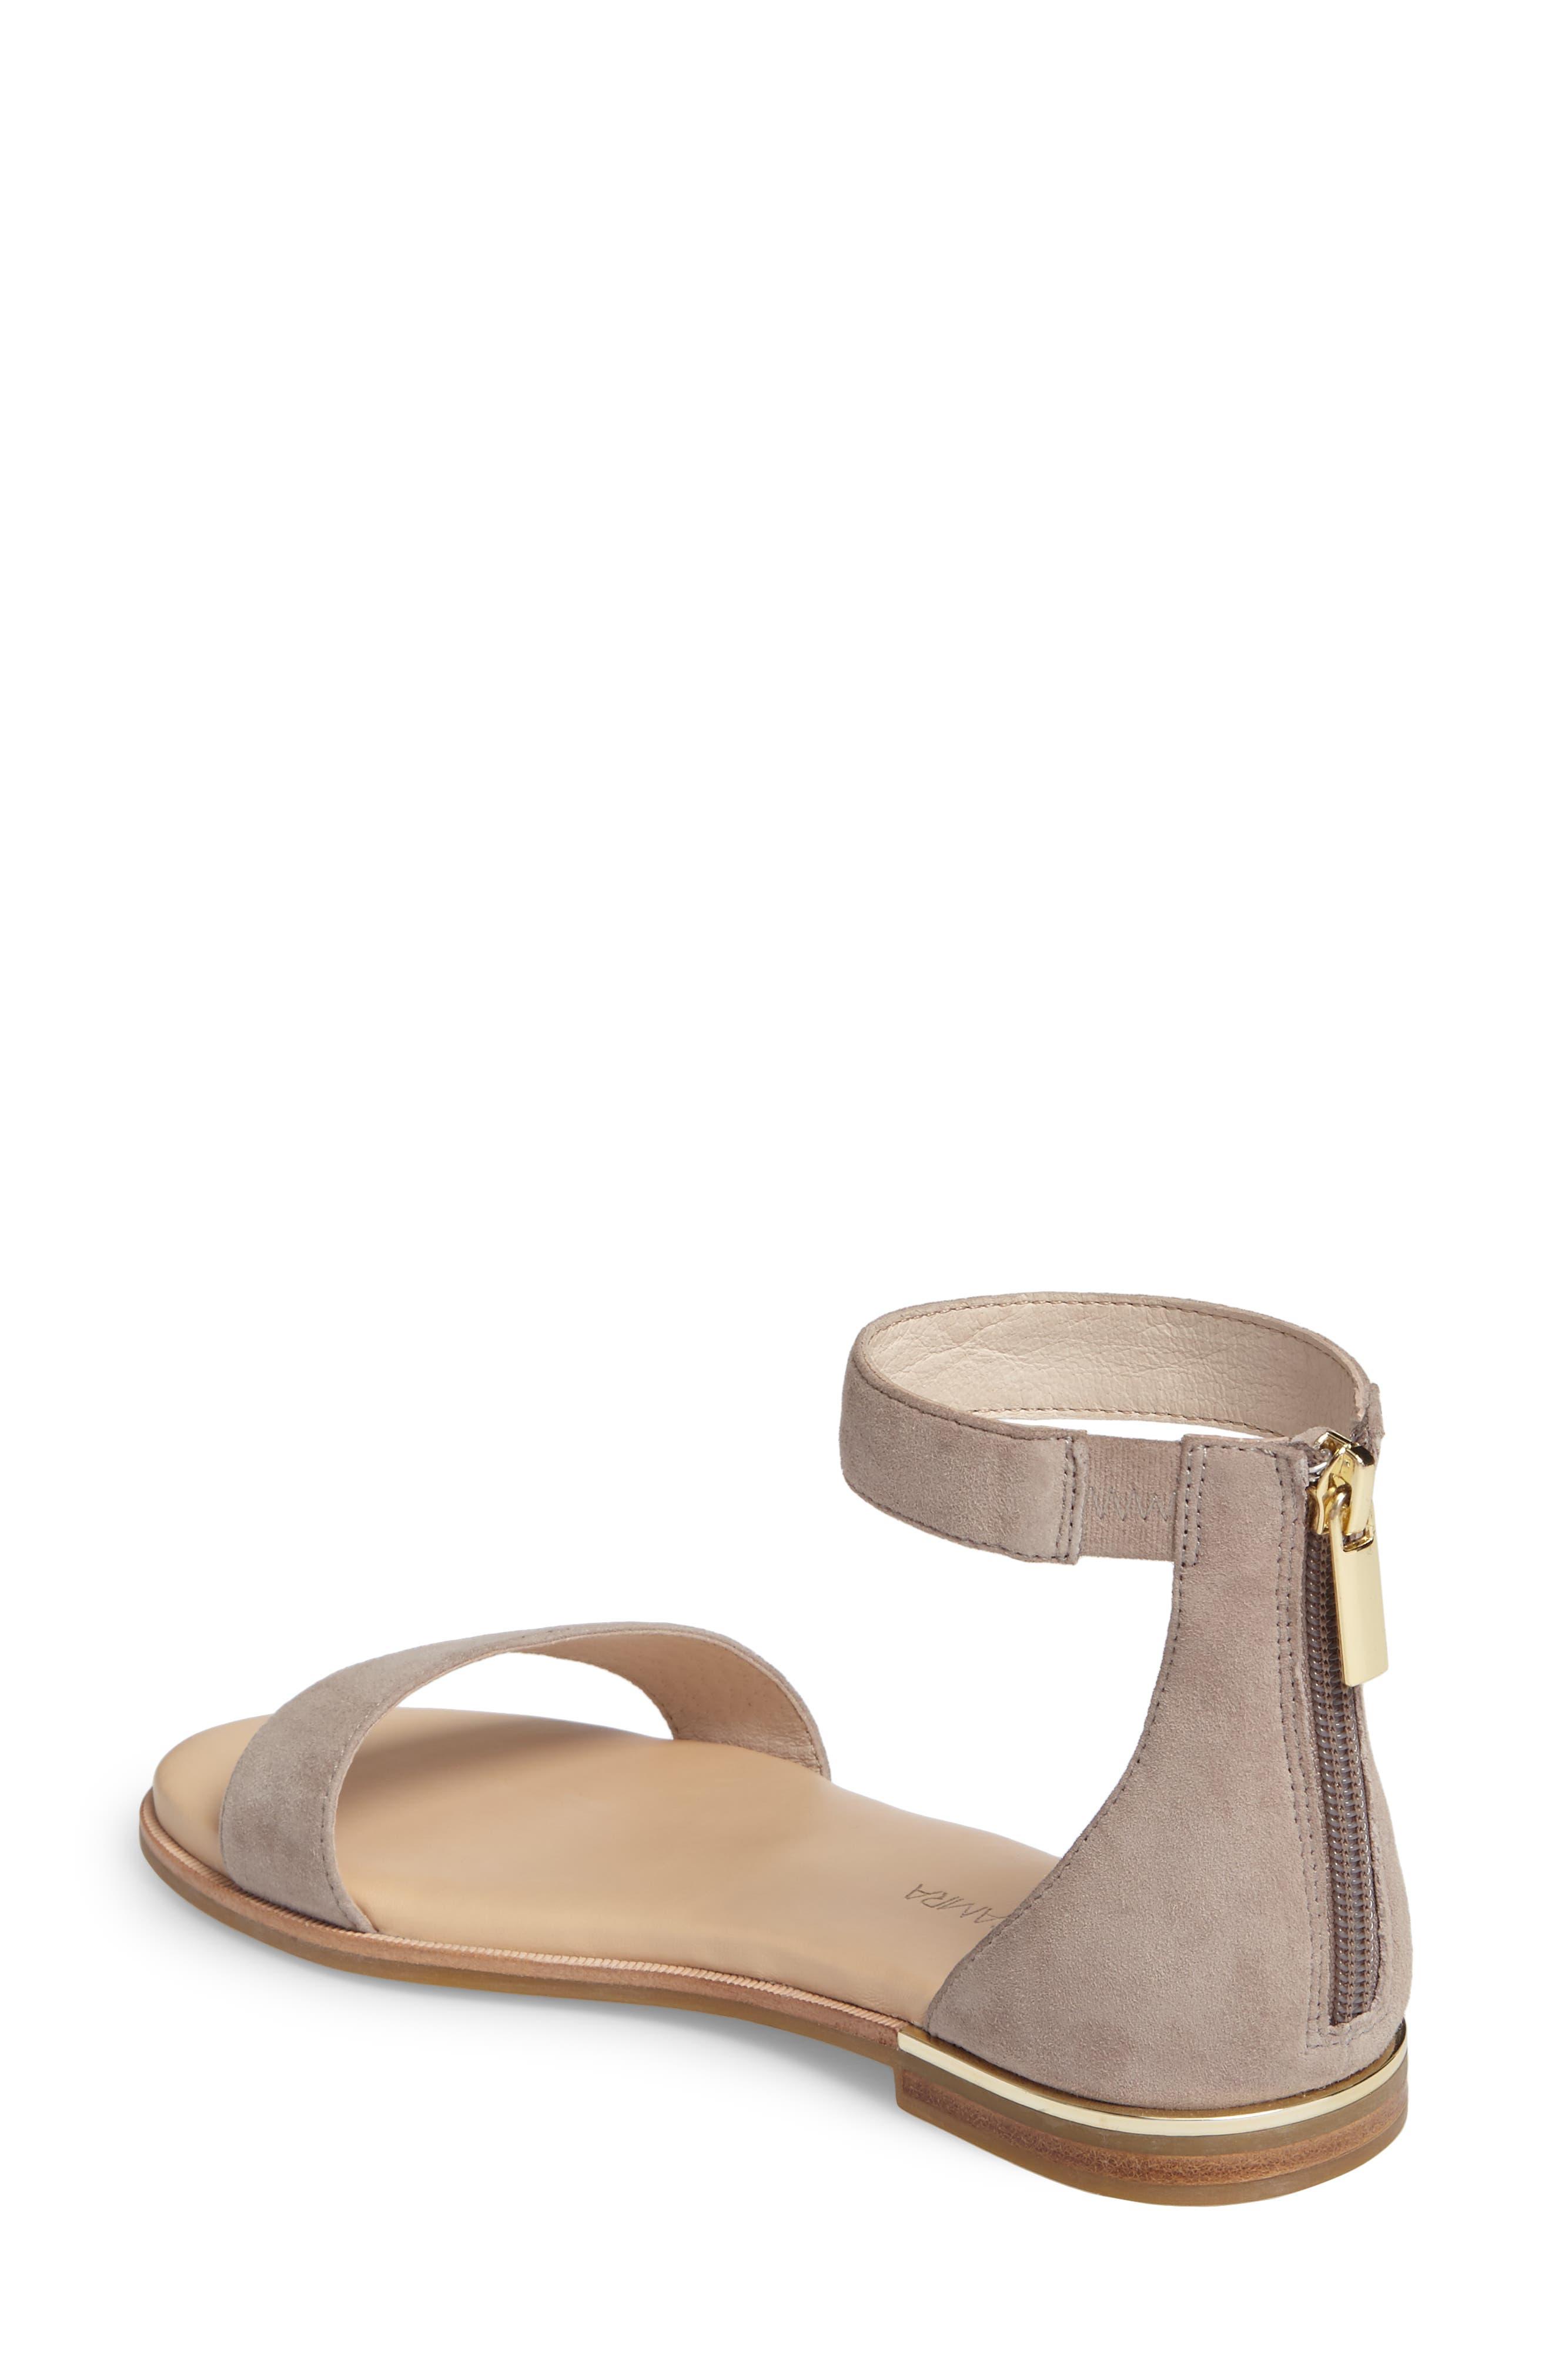 ,                             'Cambelle' Ankle Strap Sandal,                             Alternate thumbnail 34, color,                             250